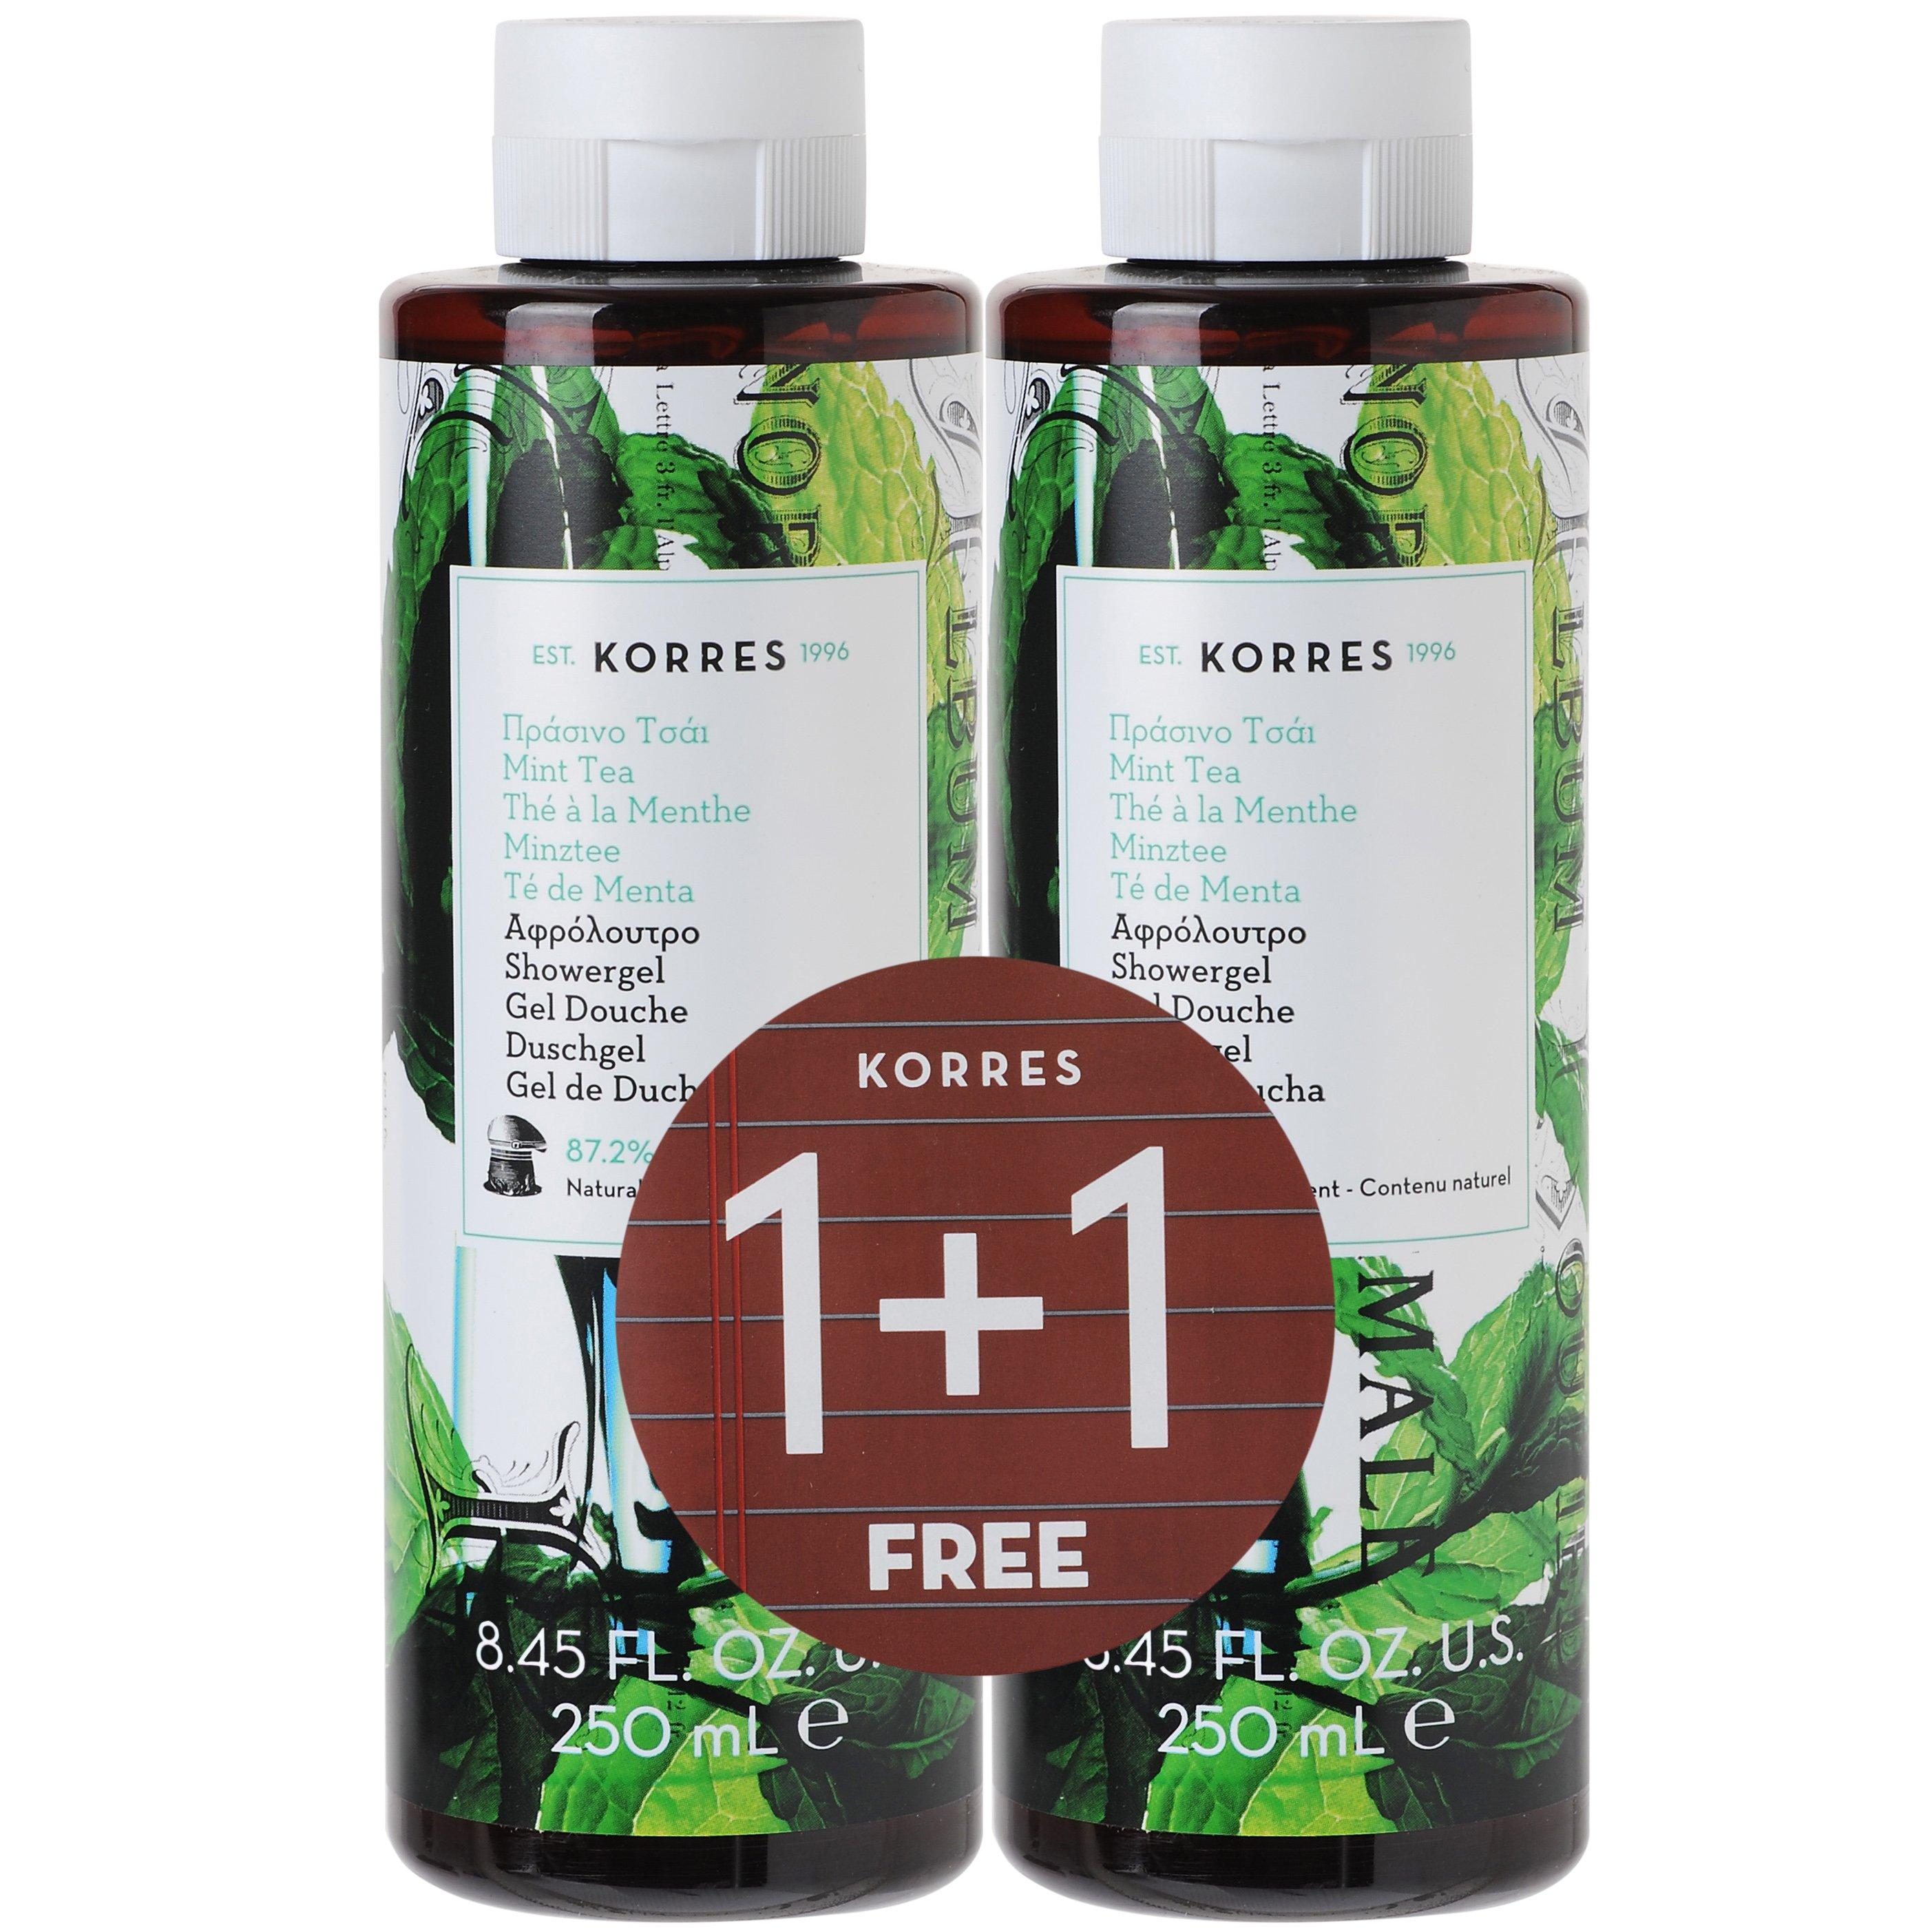 Korres Πράσινο Τσάι Οικείο Δροσερό Και Ξεχωριστό Αφρόλουτρο 1+1 Δώρο, 2 x 250ml